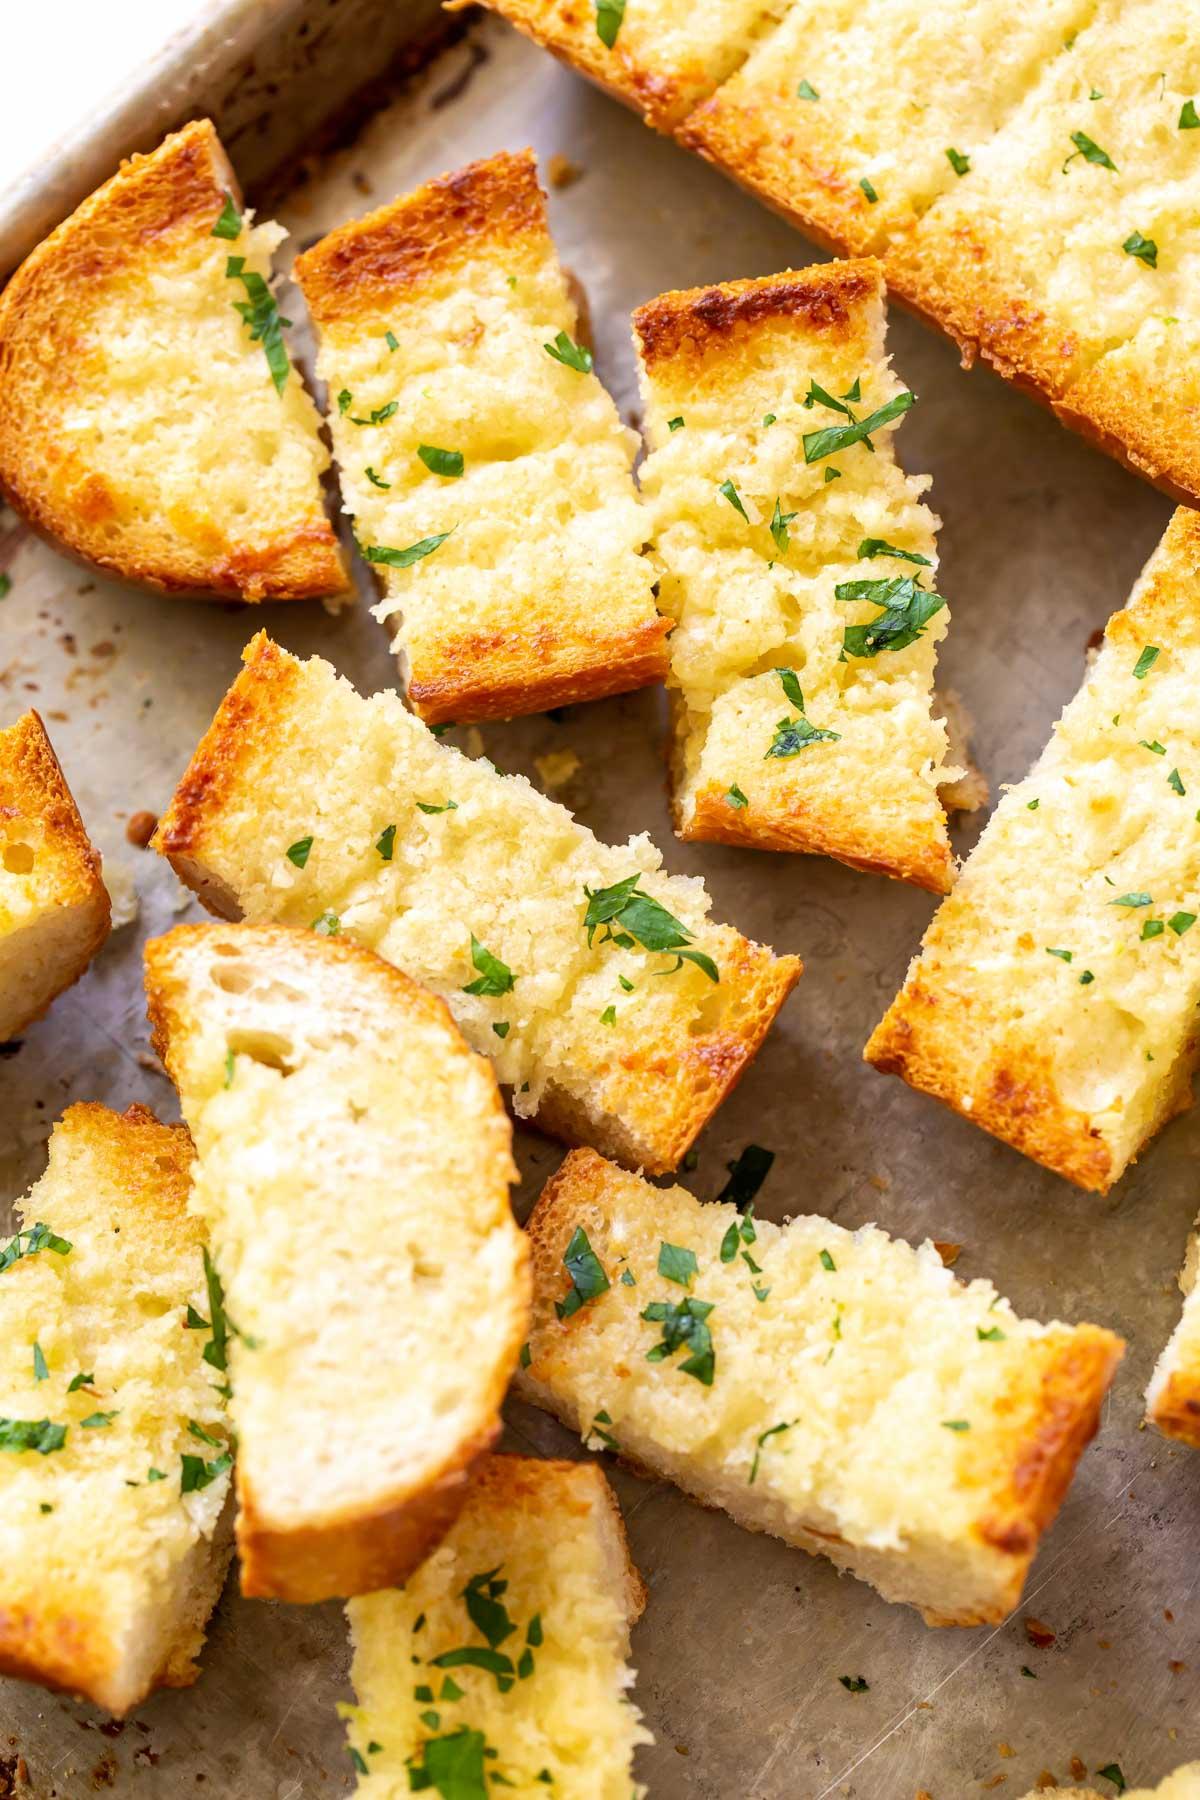 sliced garlic bread on a baking sheet